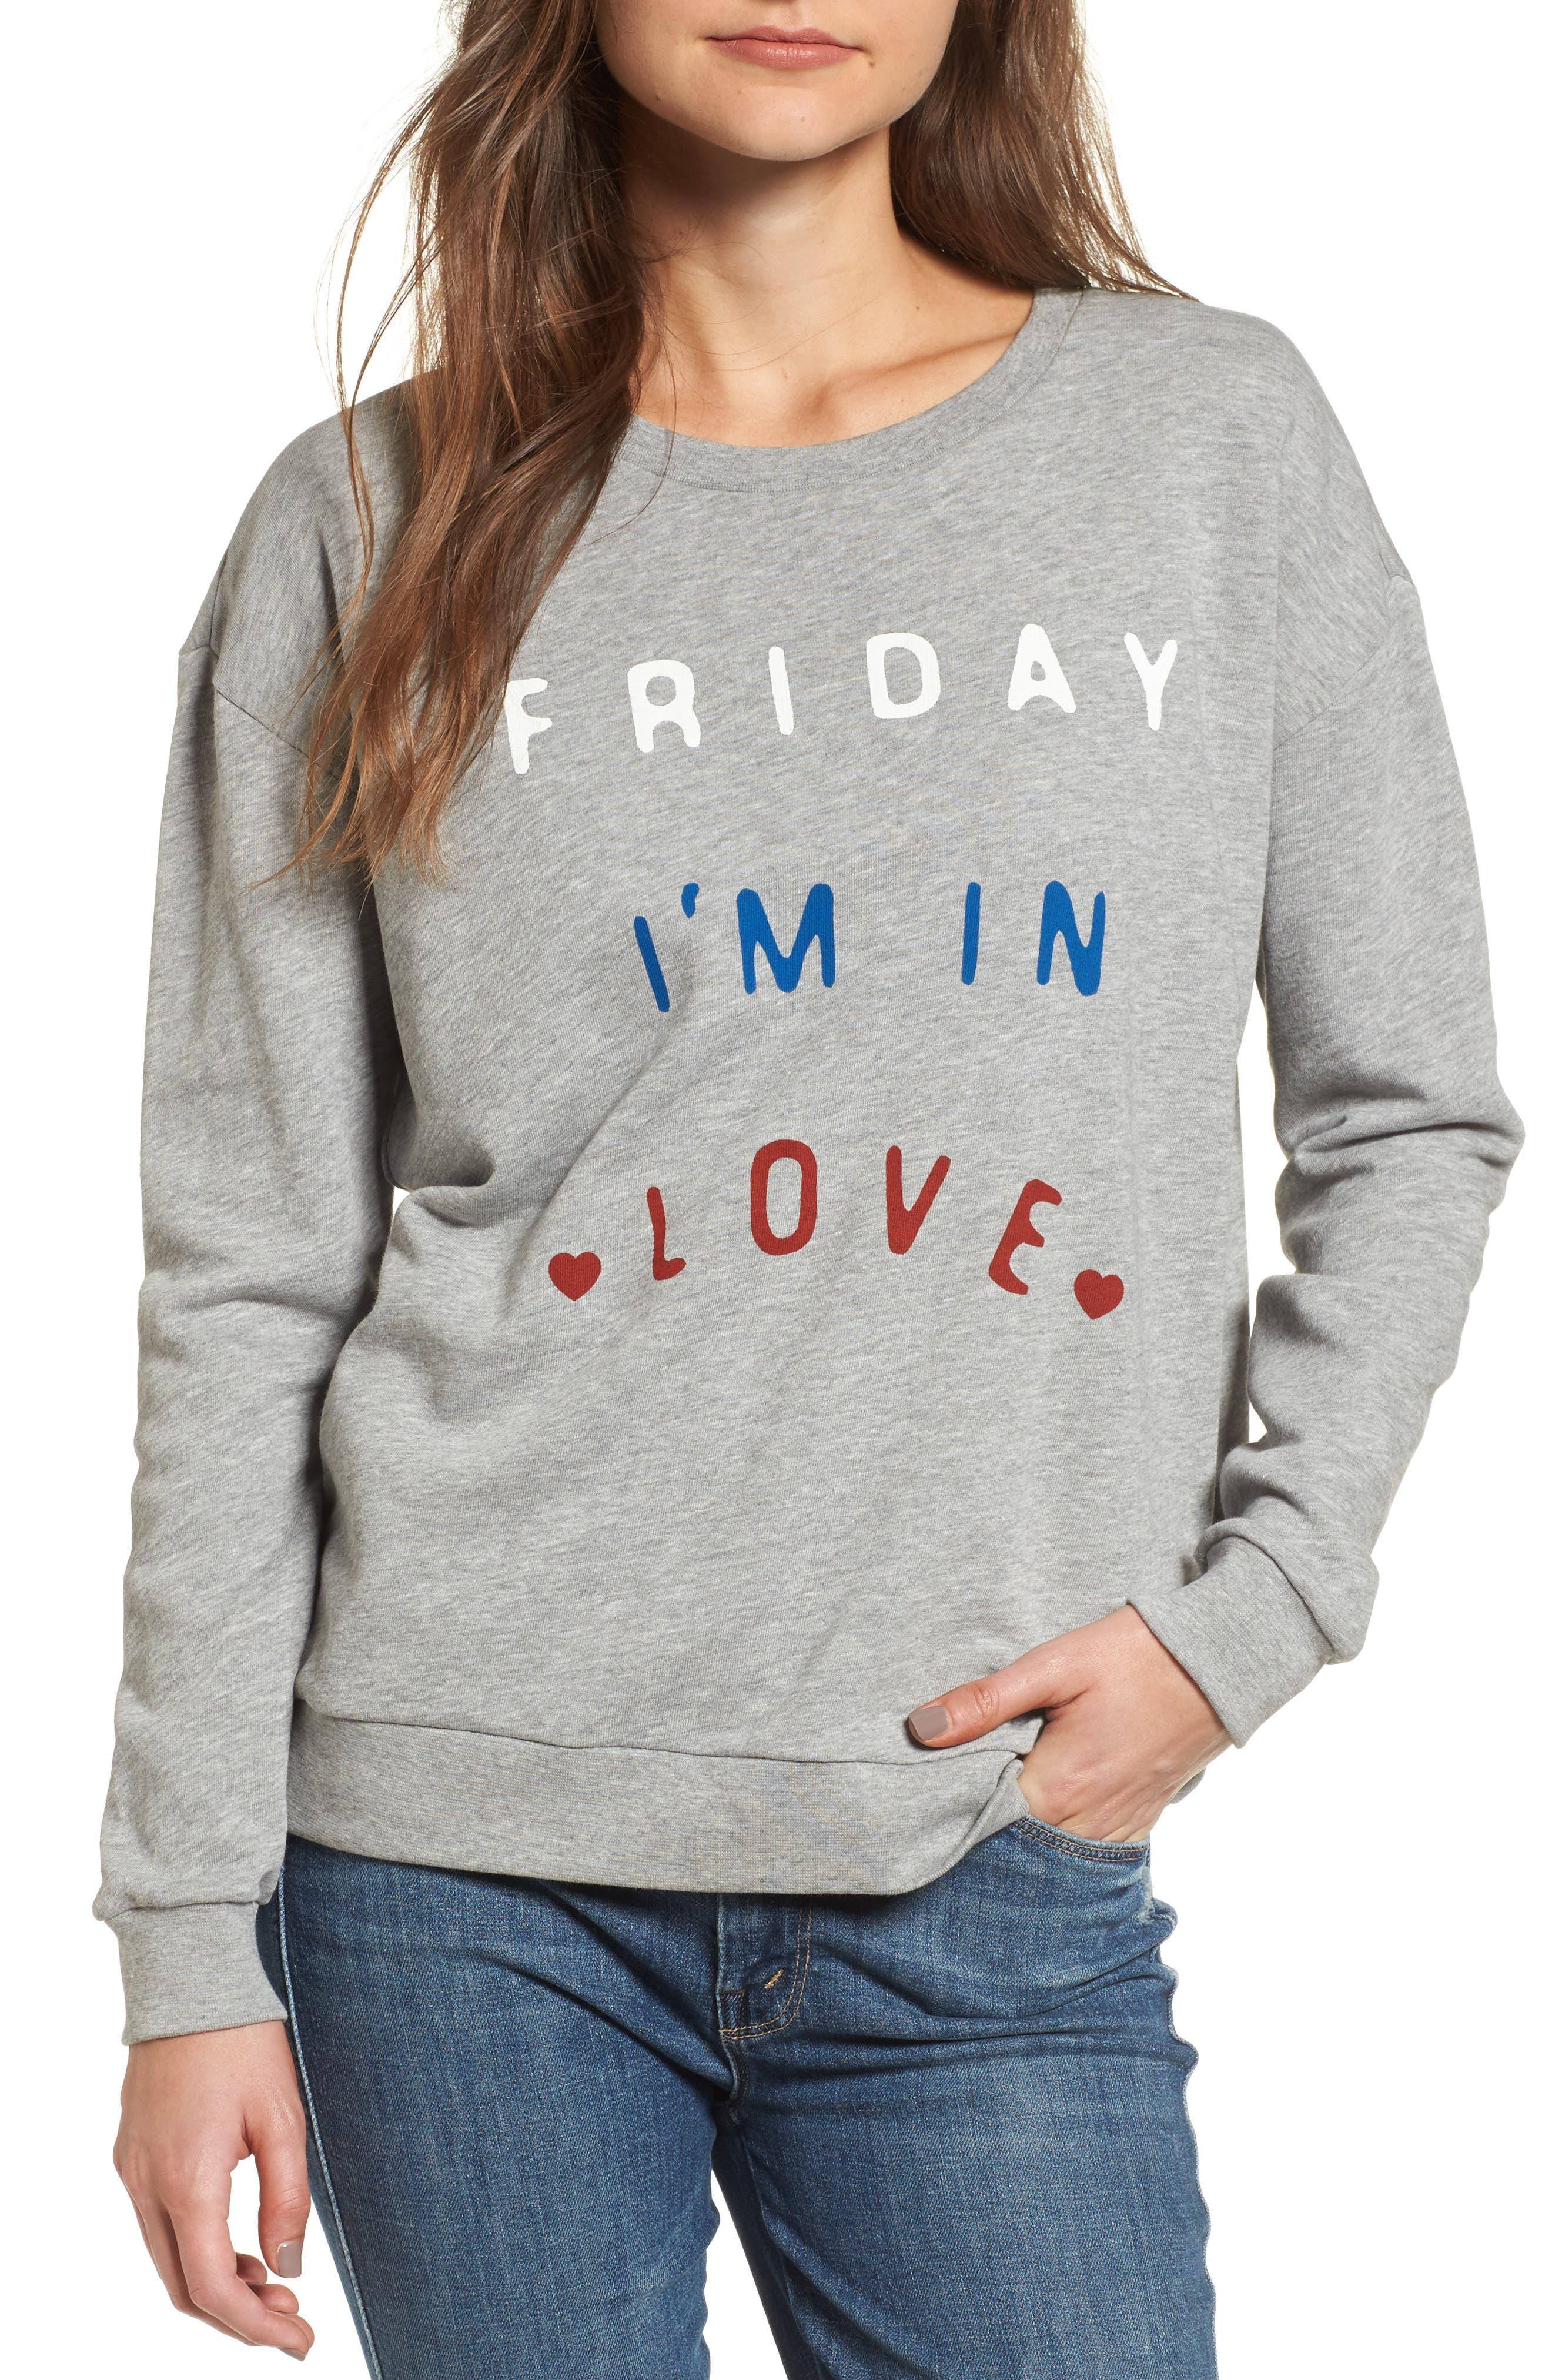 Friday I'm In Love Sweatshirt,                         Main,                         color, 020